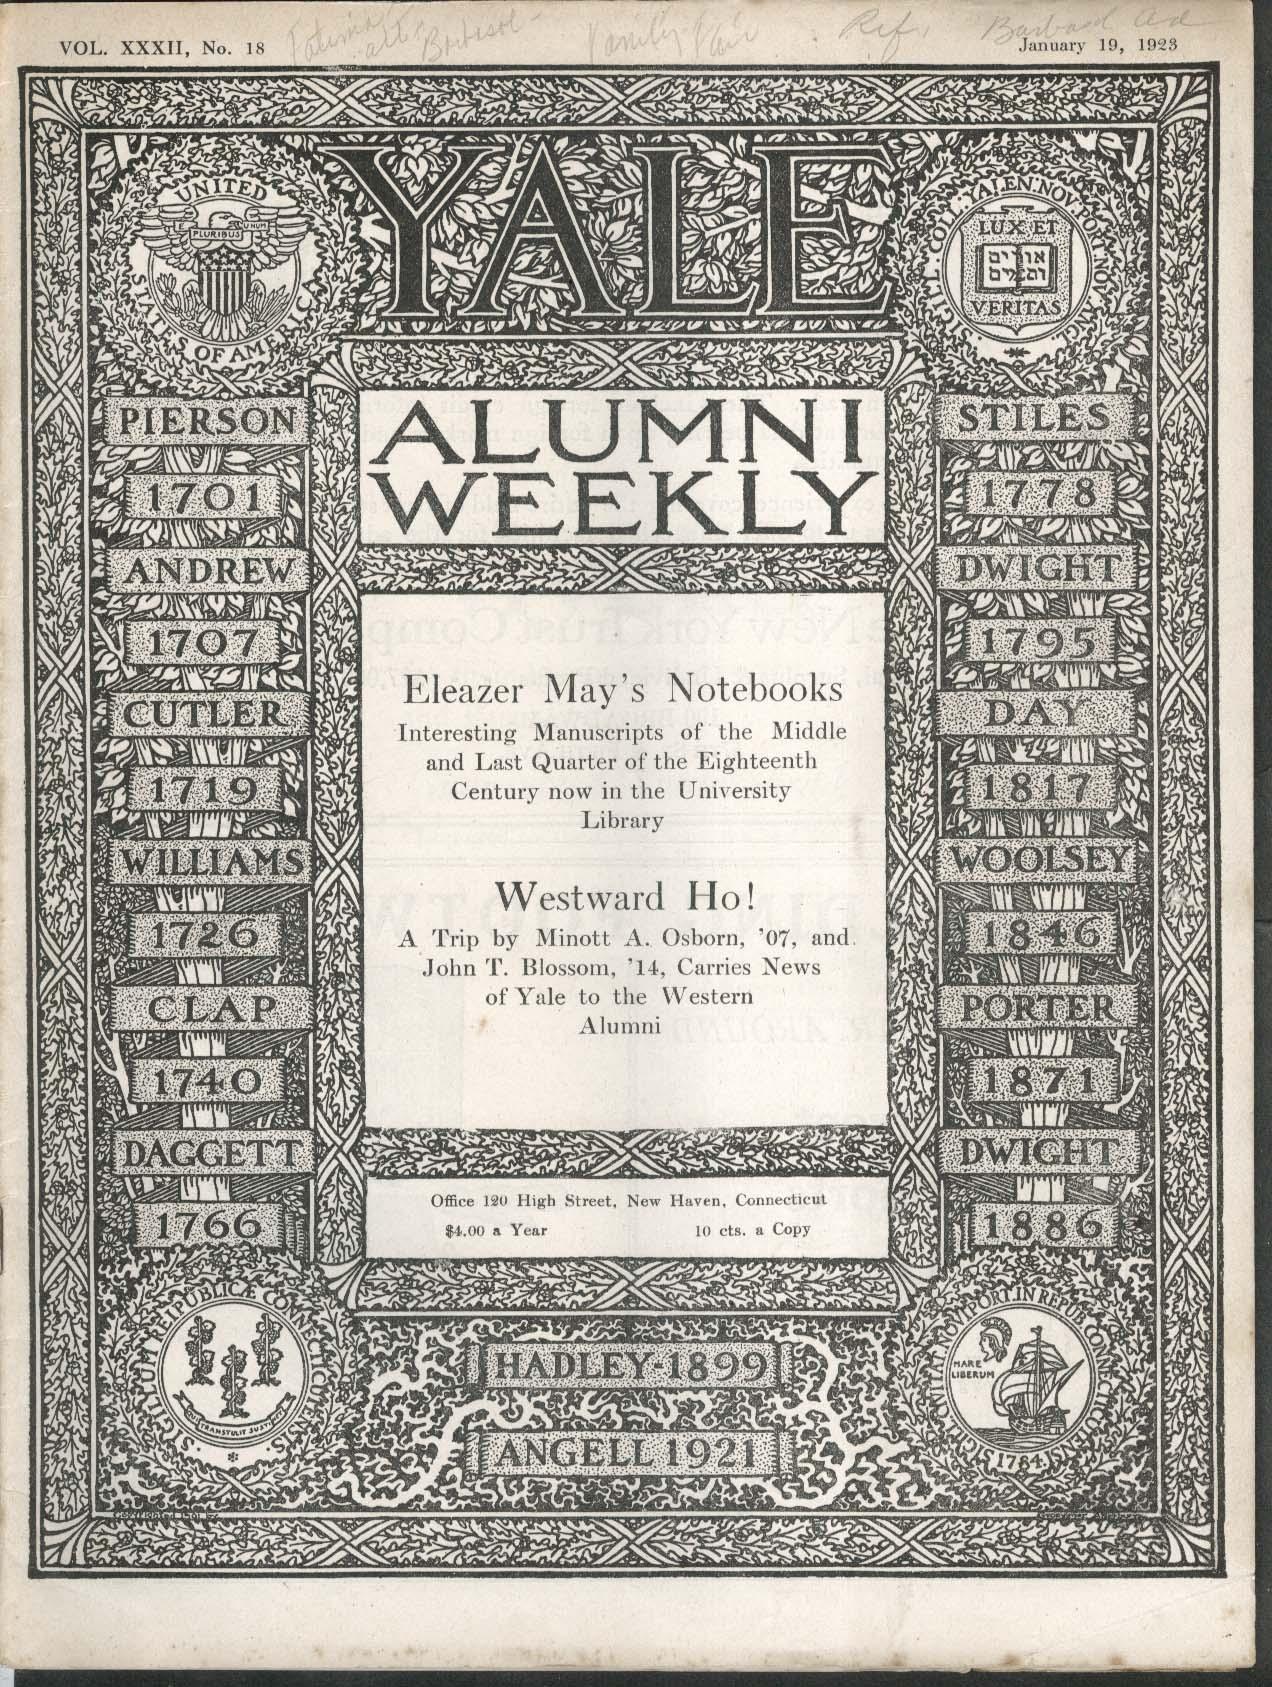 YALE ALUMNI WEEKLY Eleazer May Minott Osborn John Blossom Westward Ho! 1/19 1923